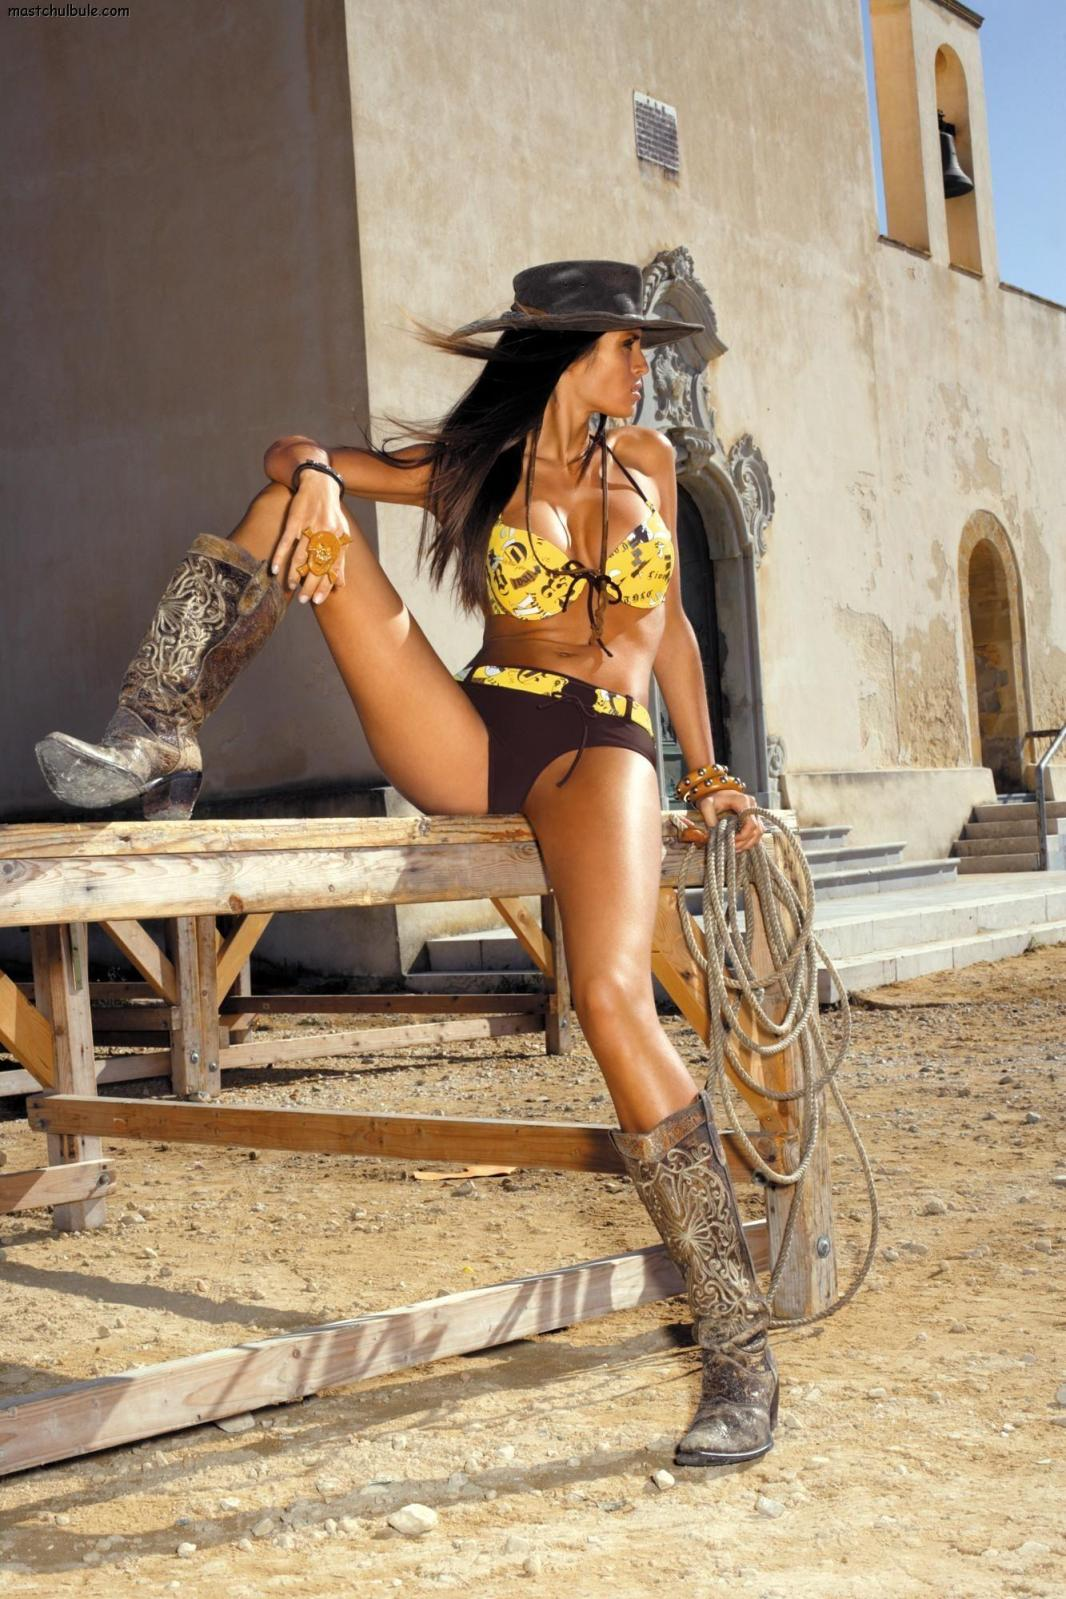 http://3.bp.blogspot.com/-uoJLlNfpSew/T6V2cpbluaI/AAAAAAAABs4/DohDPK0pW0E/s1600/Beatrice+Chirita+7.jpg